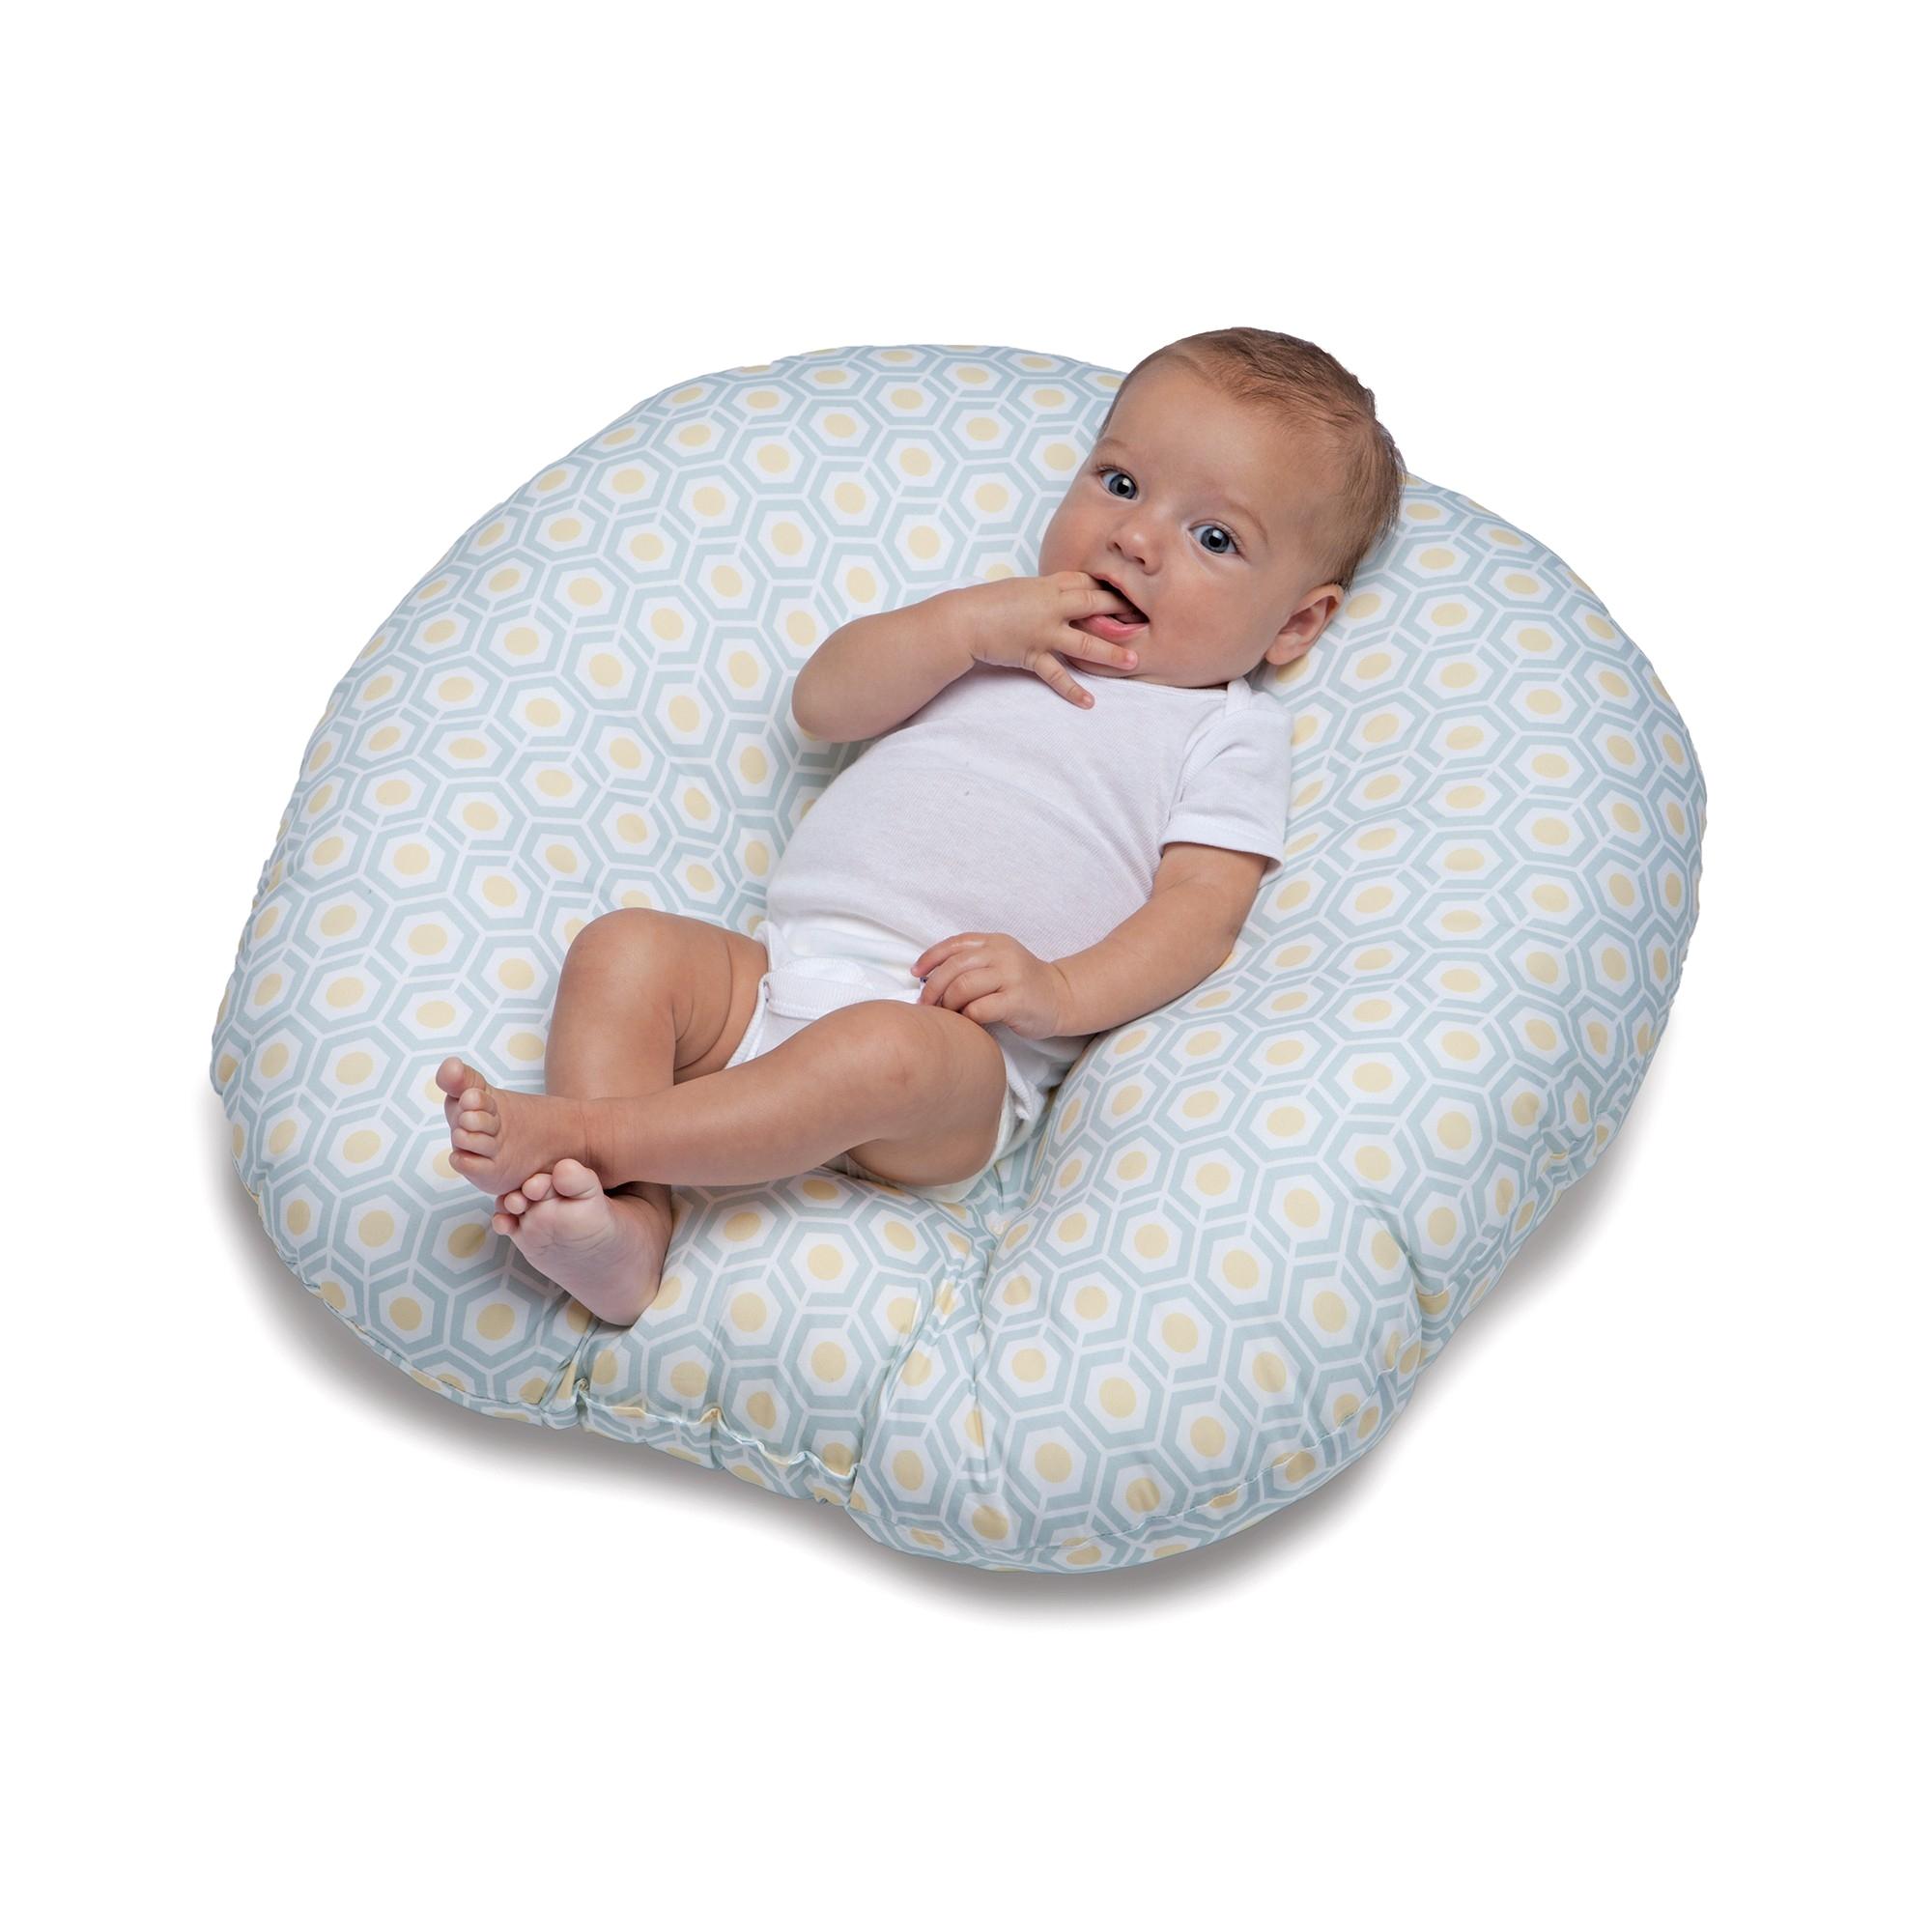 Boppy Baby Chair Vs Bumbo Boppy Meet the New Baby Chair Fine Ankitsingh Me